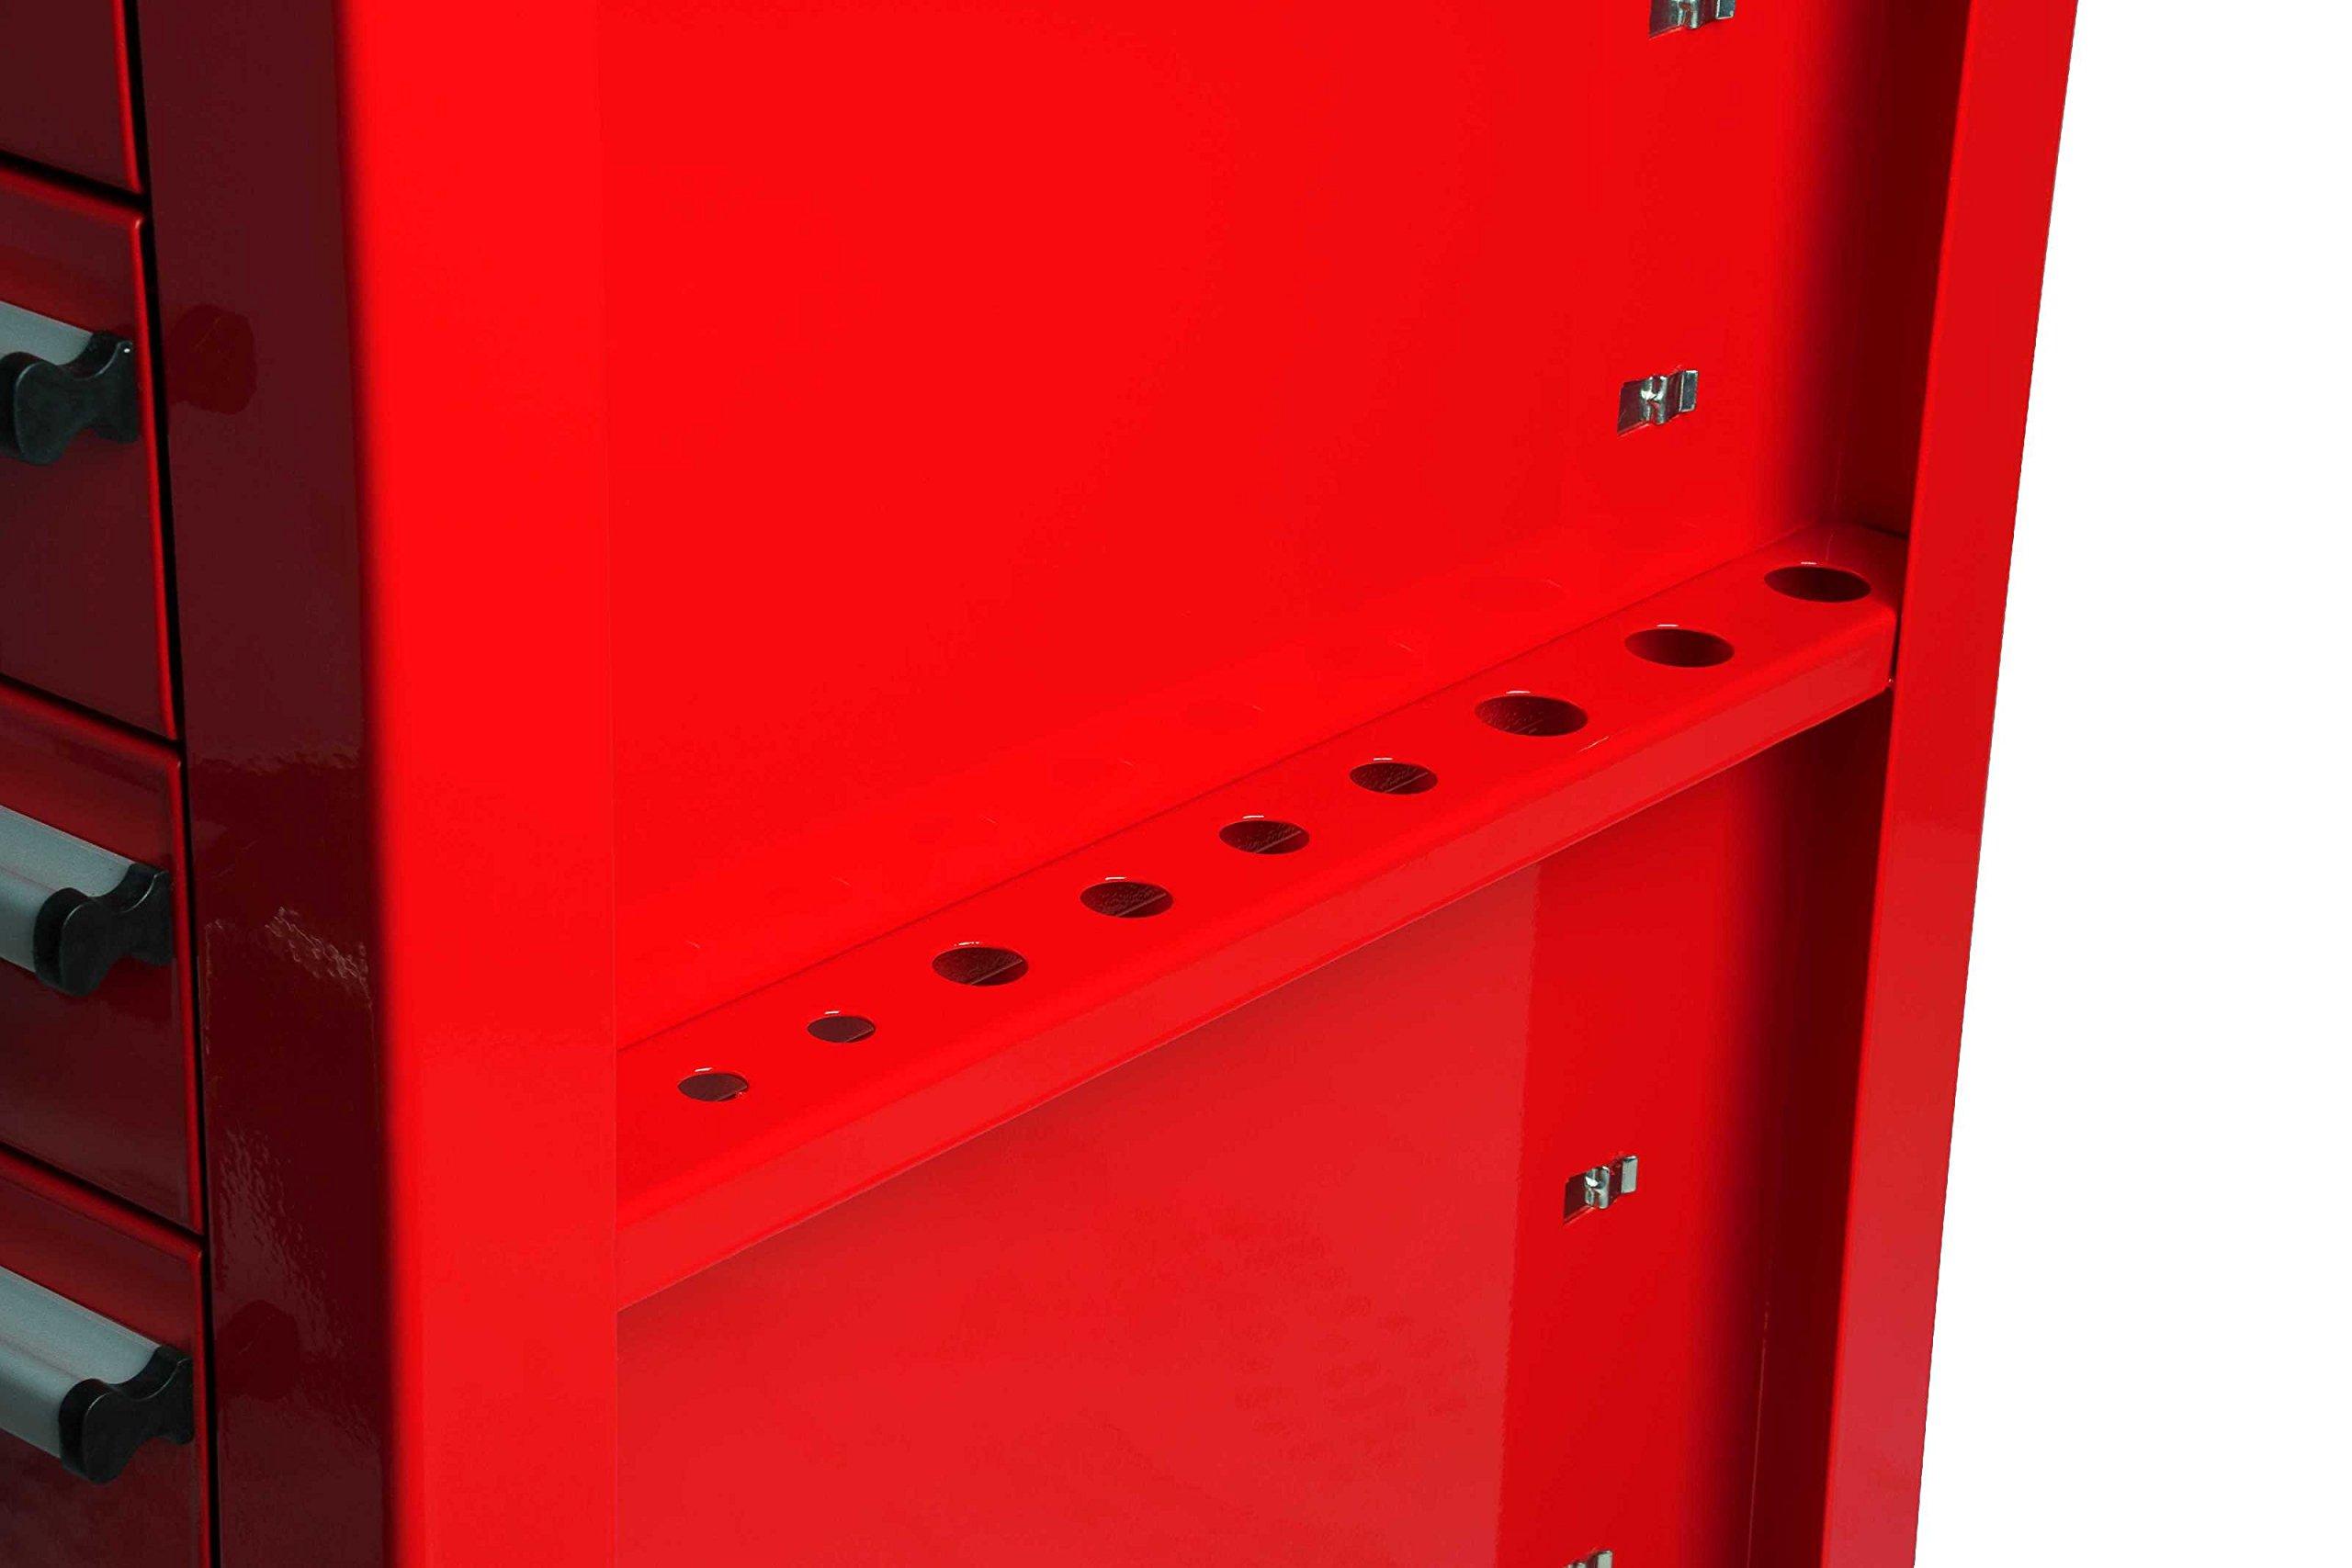 Sunex 8057 Premium Full Drawer Service Red Cart by Sunex Tools (Image #7)